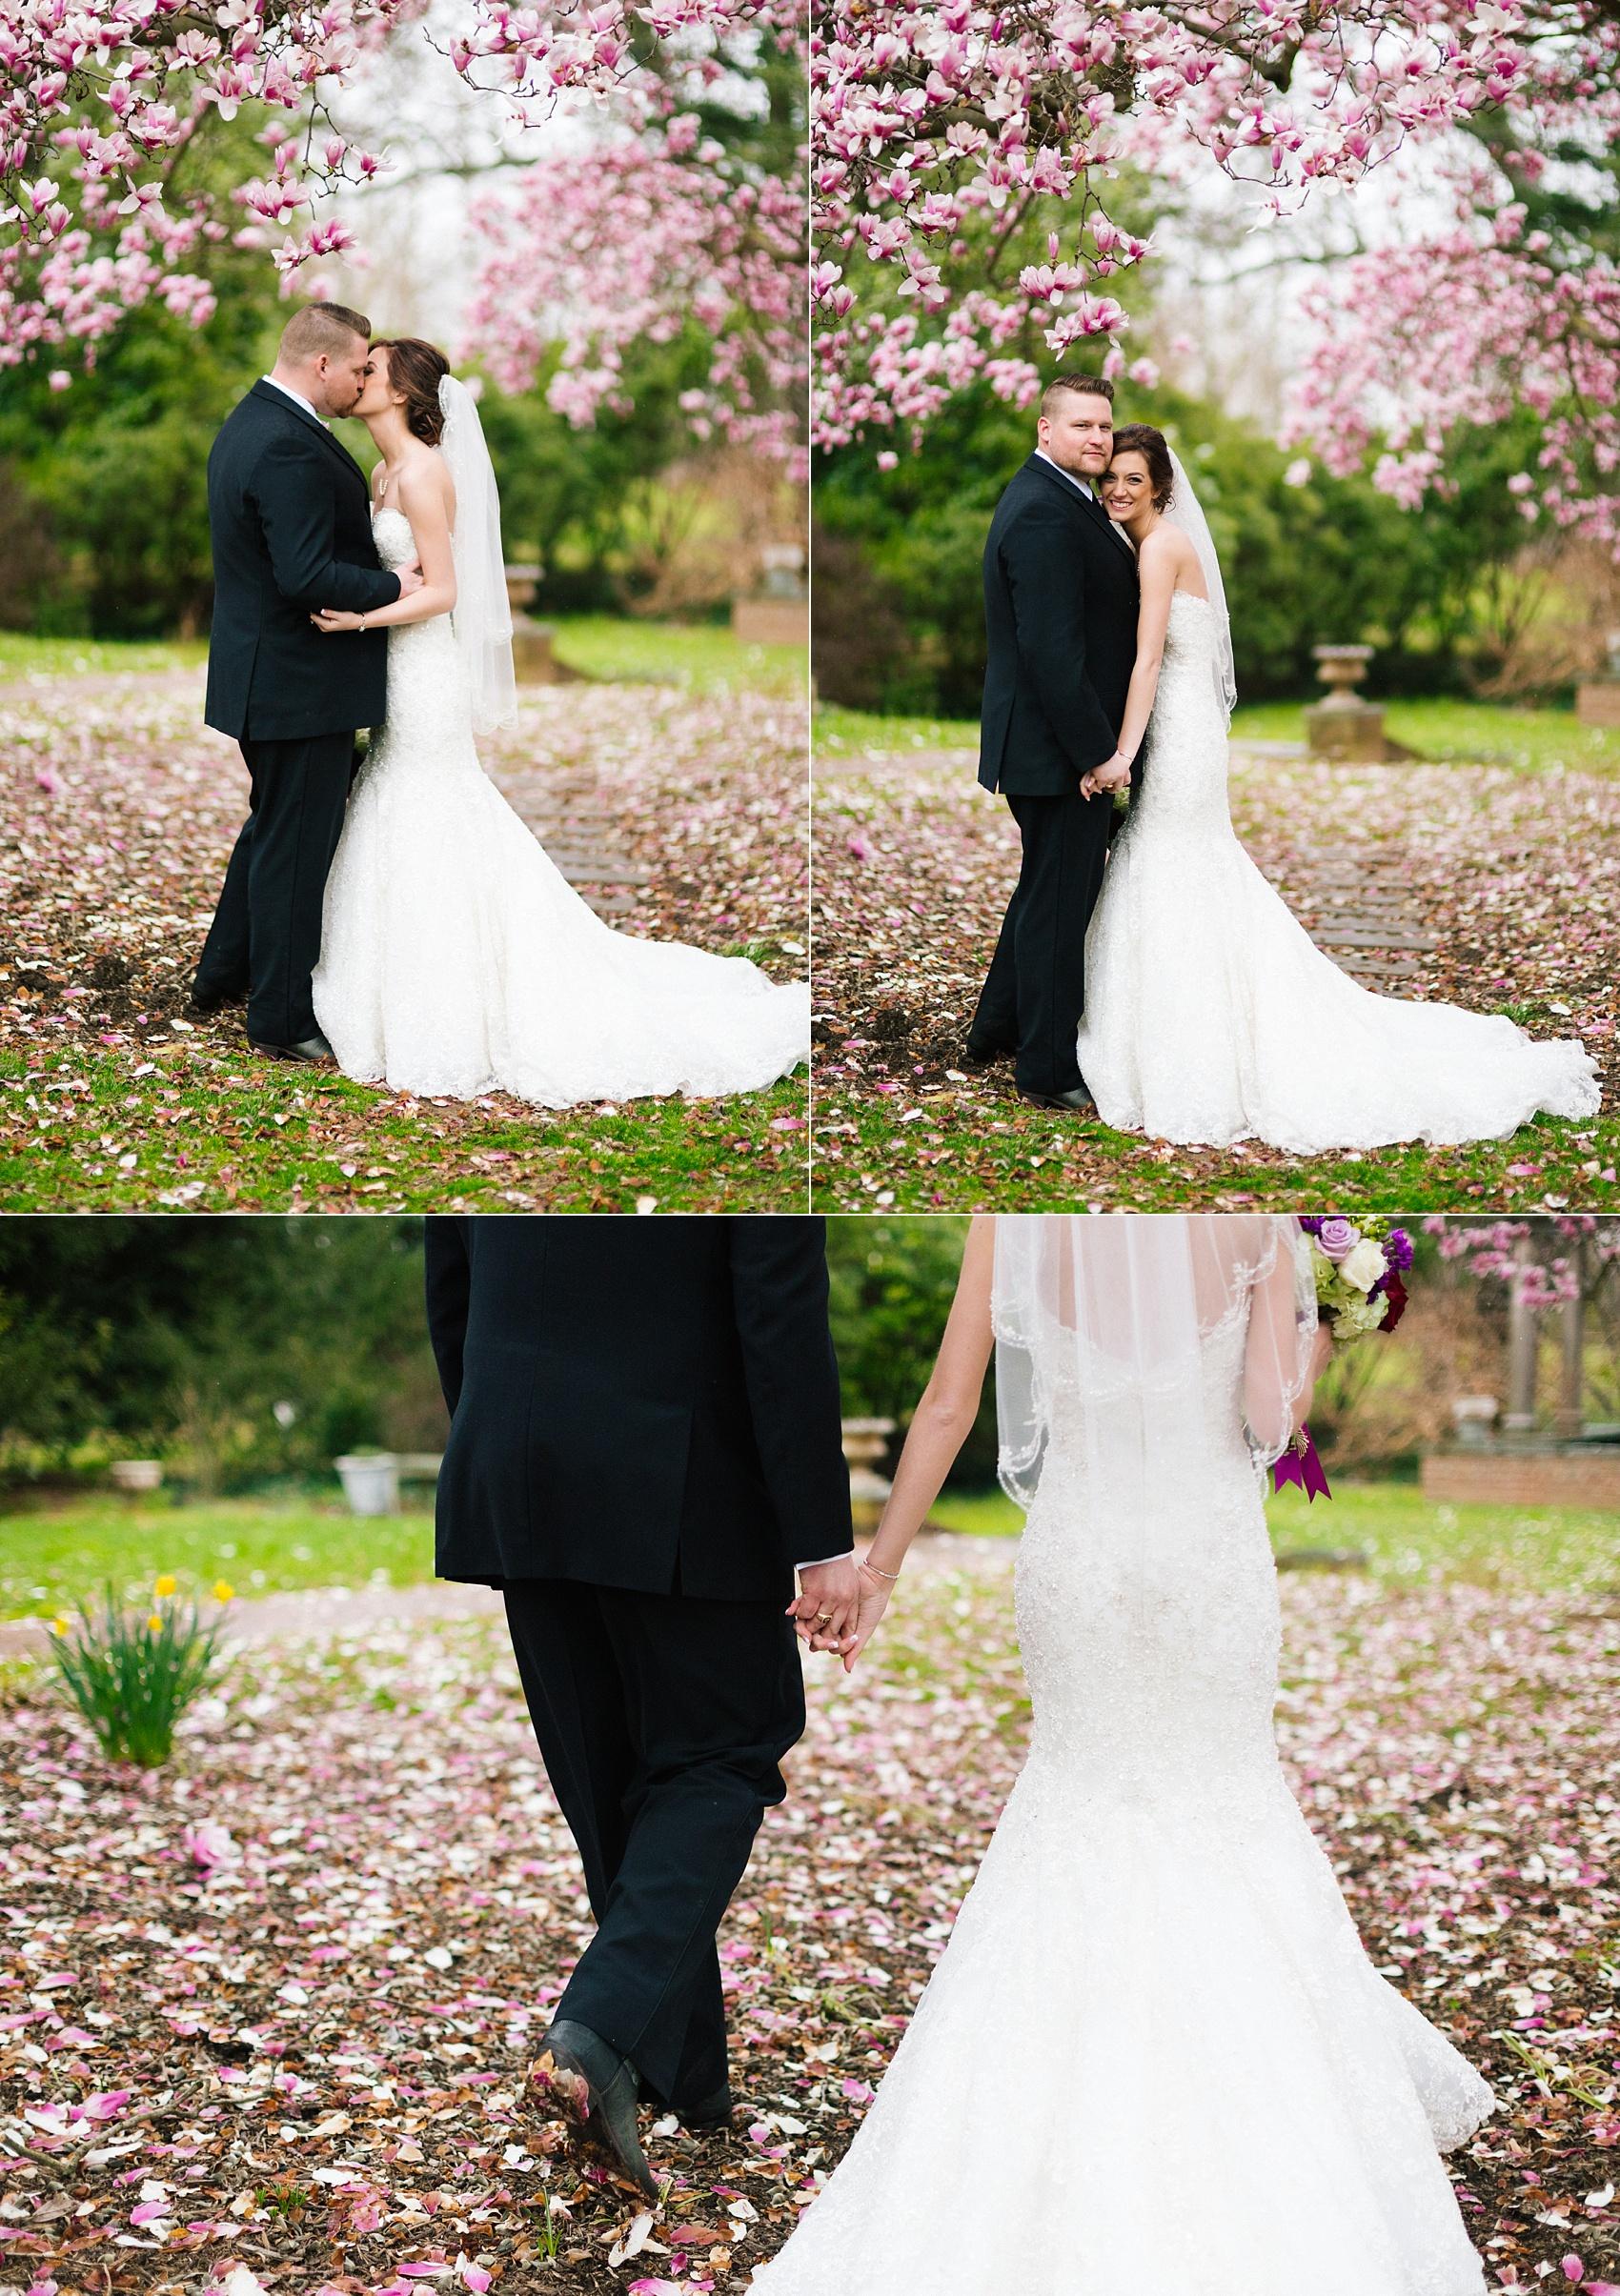 dwayne lydia delaware wedding philadelphia baltimore washingtion dc wedding photographer-23